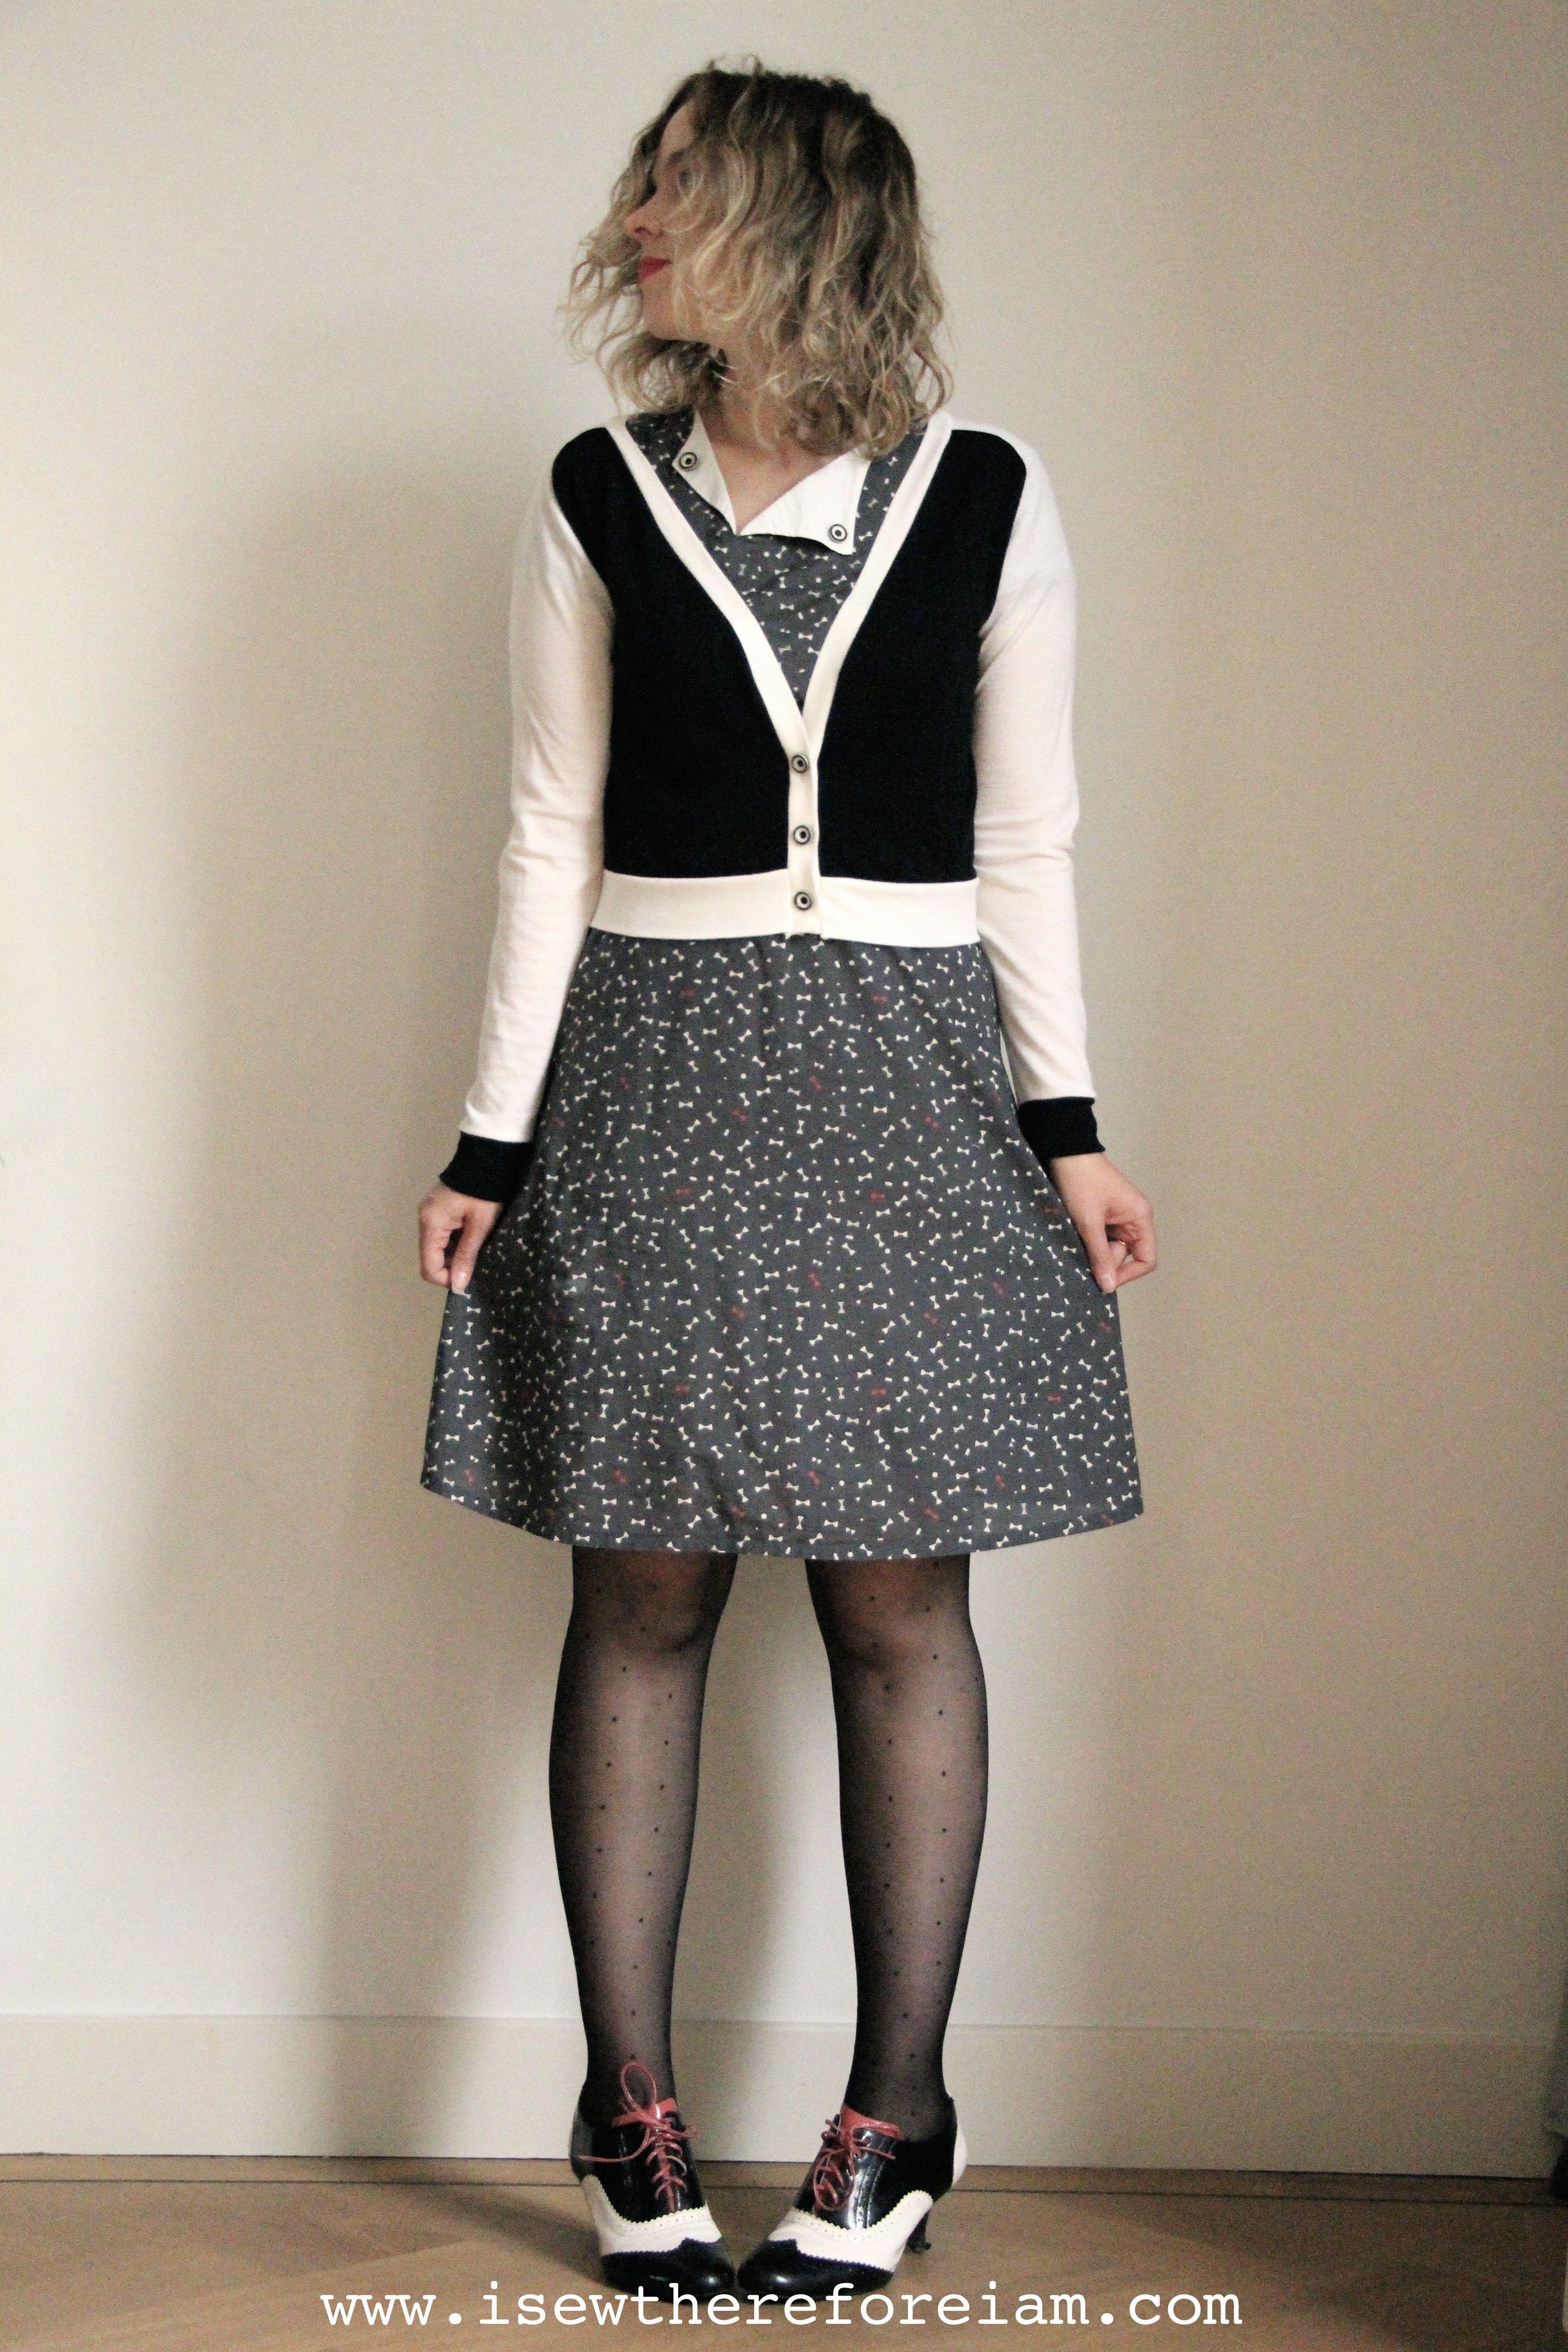 Juniper Cardigan by Jennifer Lauren in merino jersey from The Fabric Store